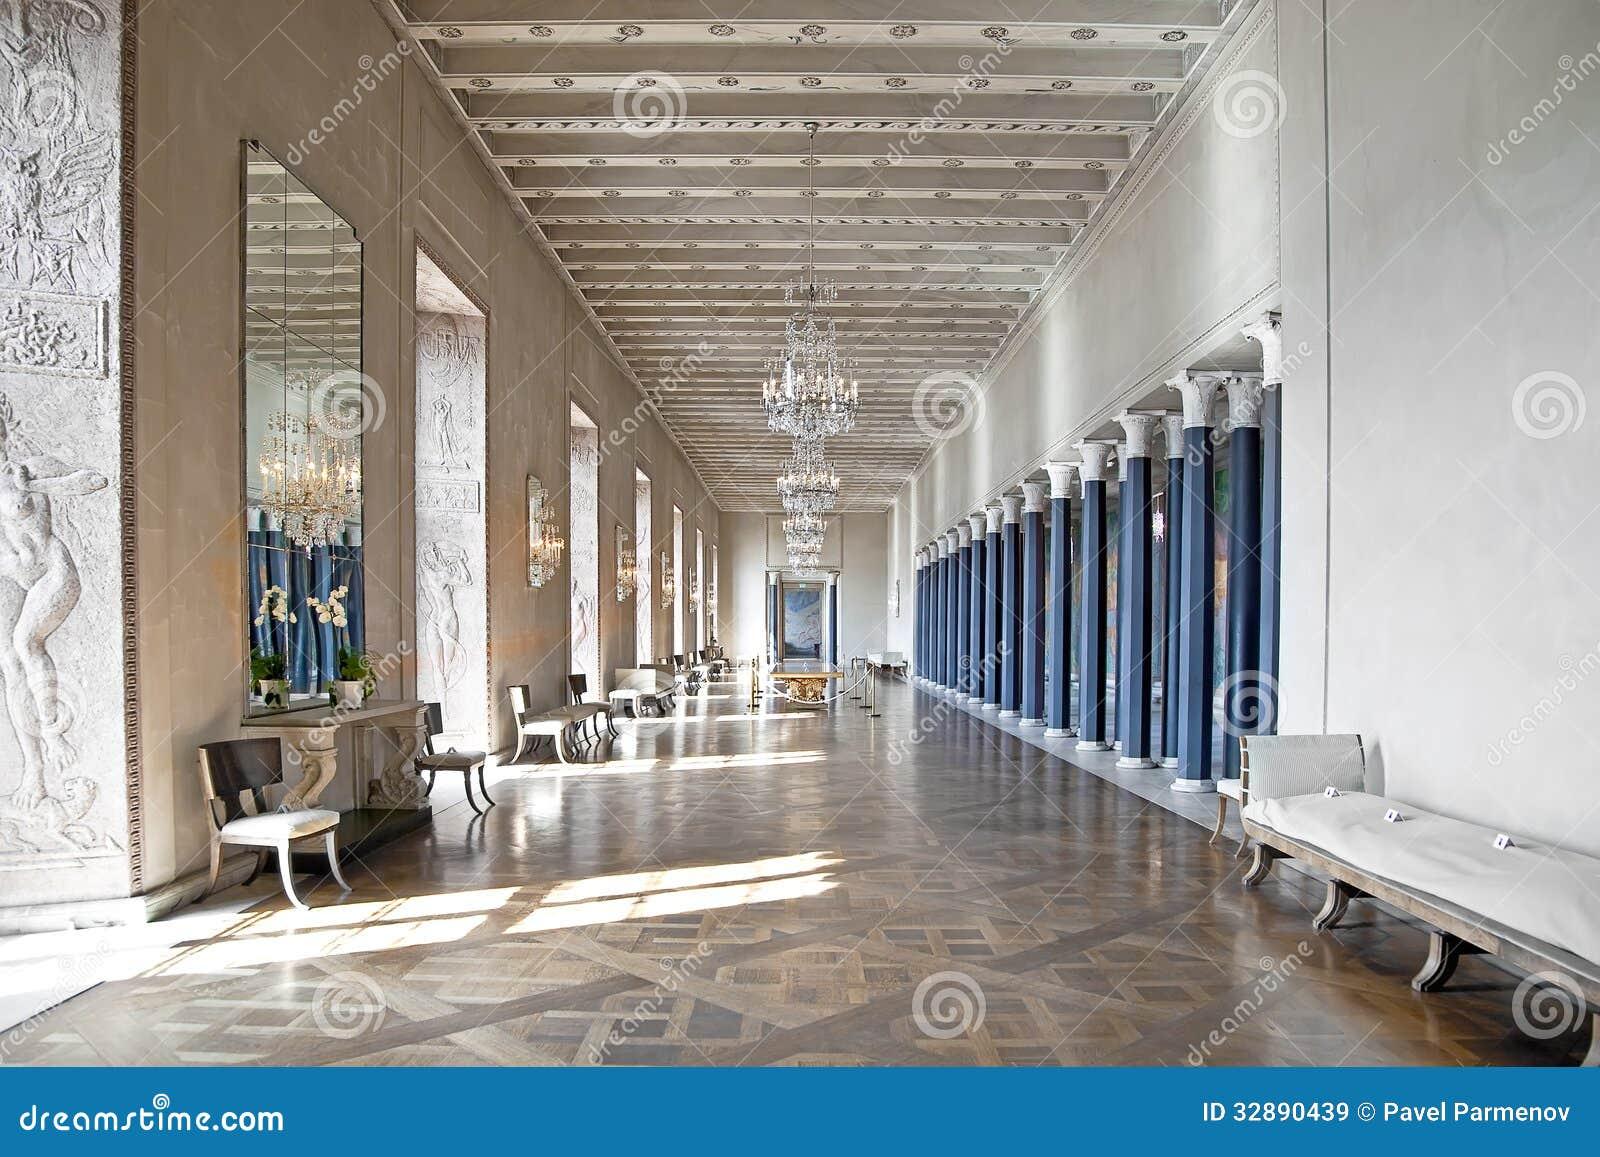 Eugene Gallery Hall Interior Prince Reception Stockholm